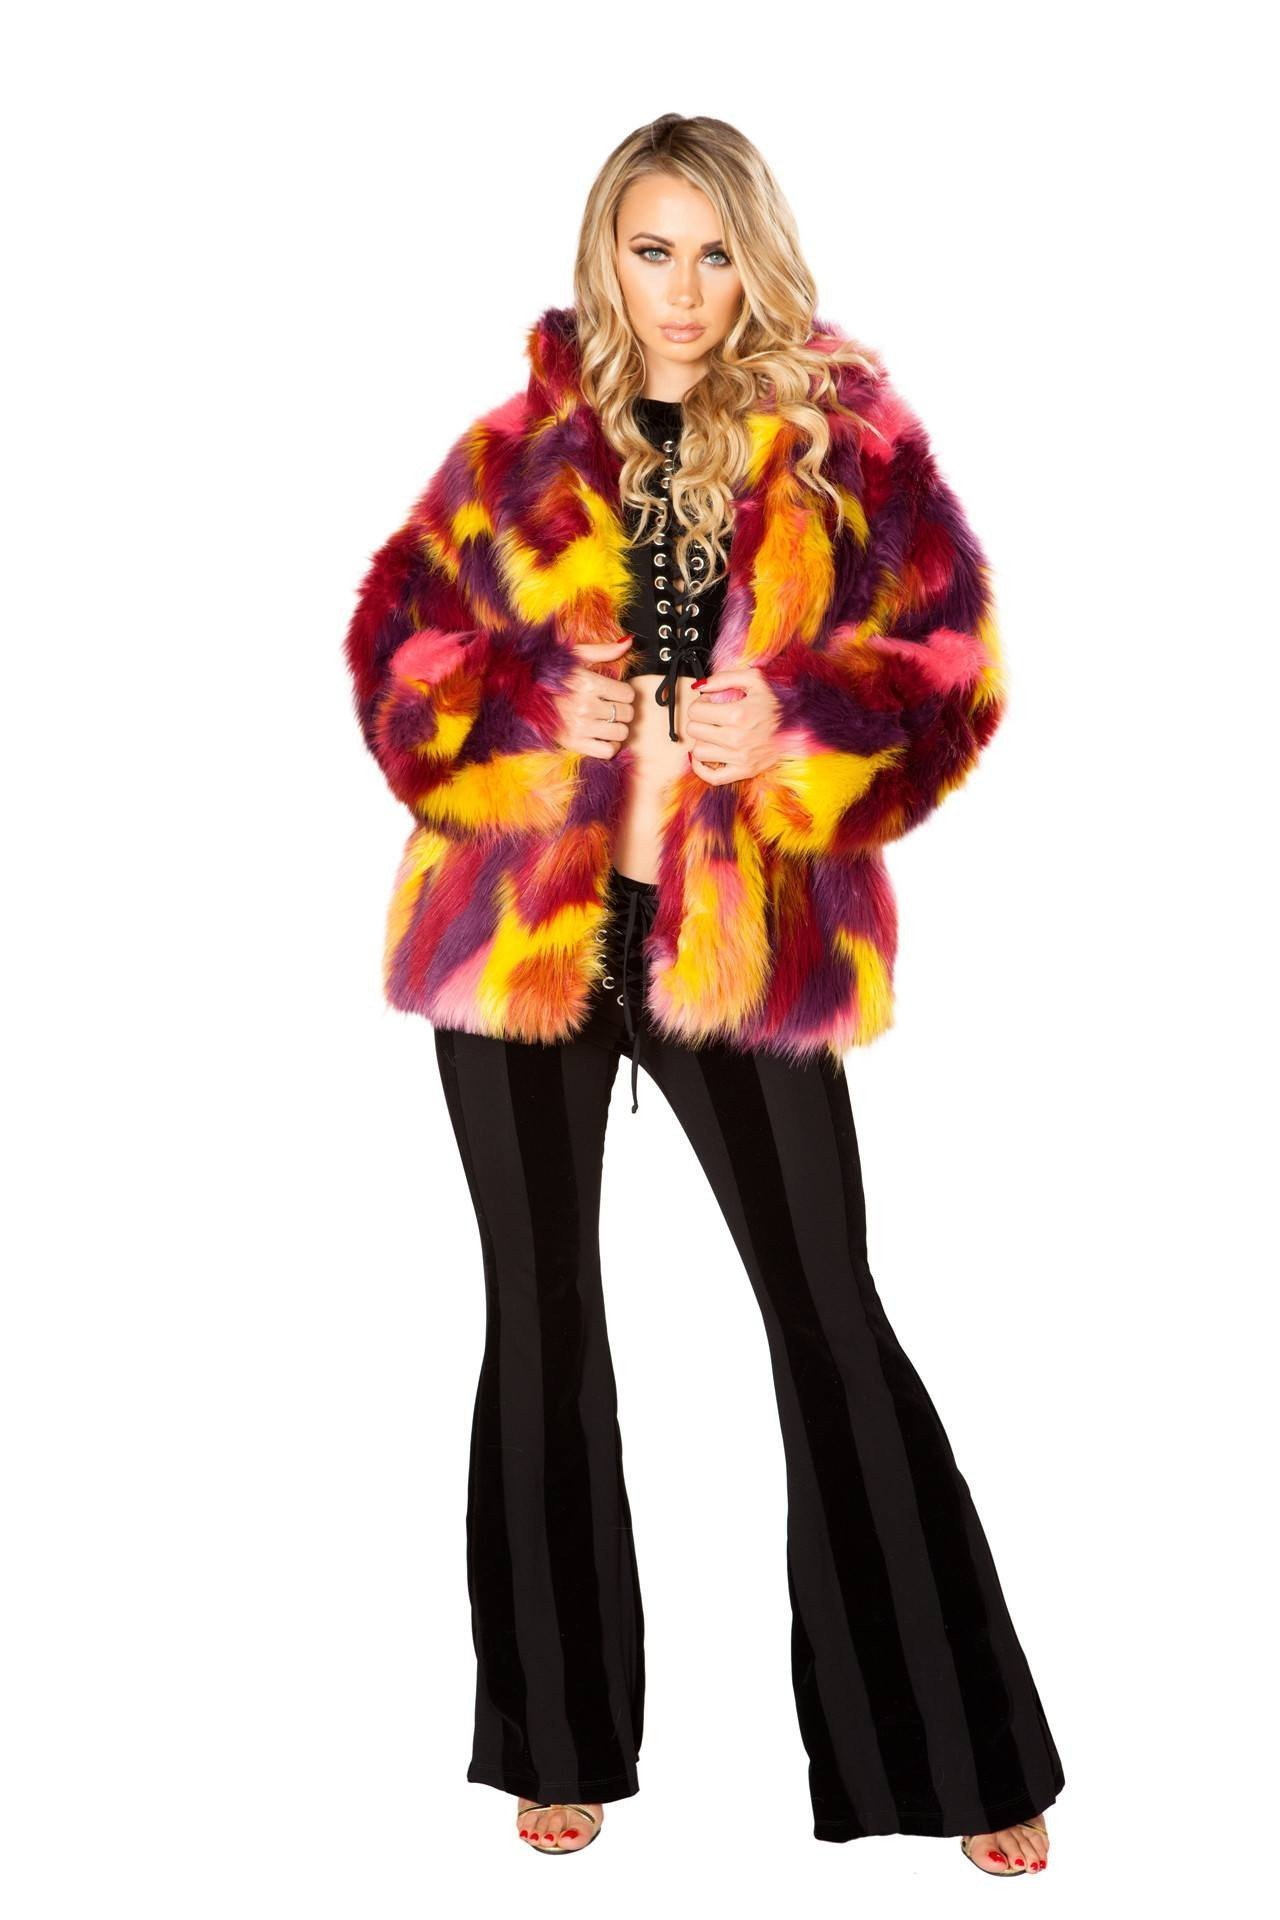 J. Valentine London Hip Length Coat Bundle with Pink Shorts